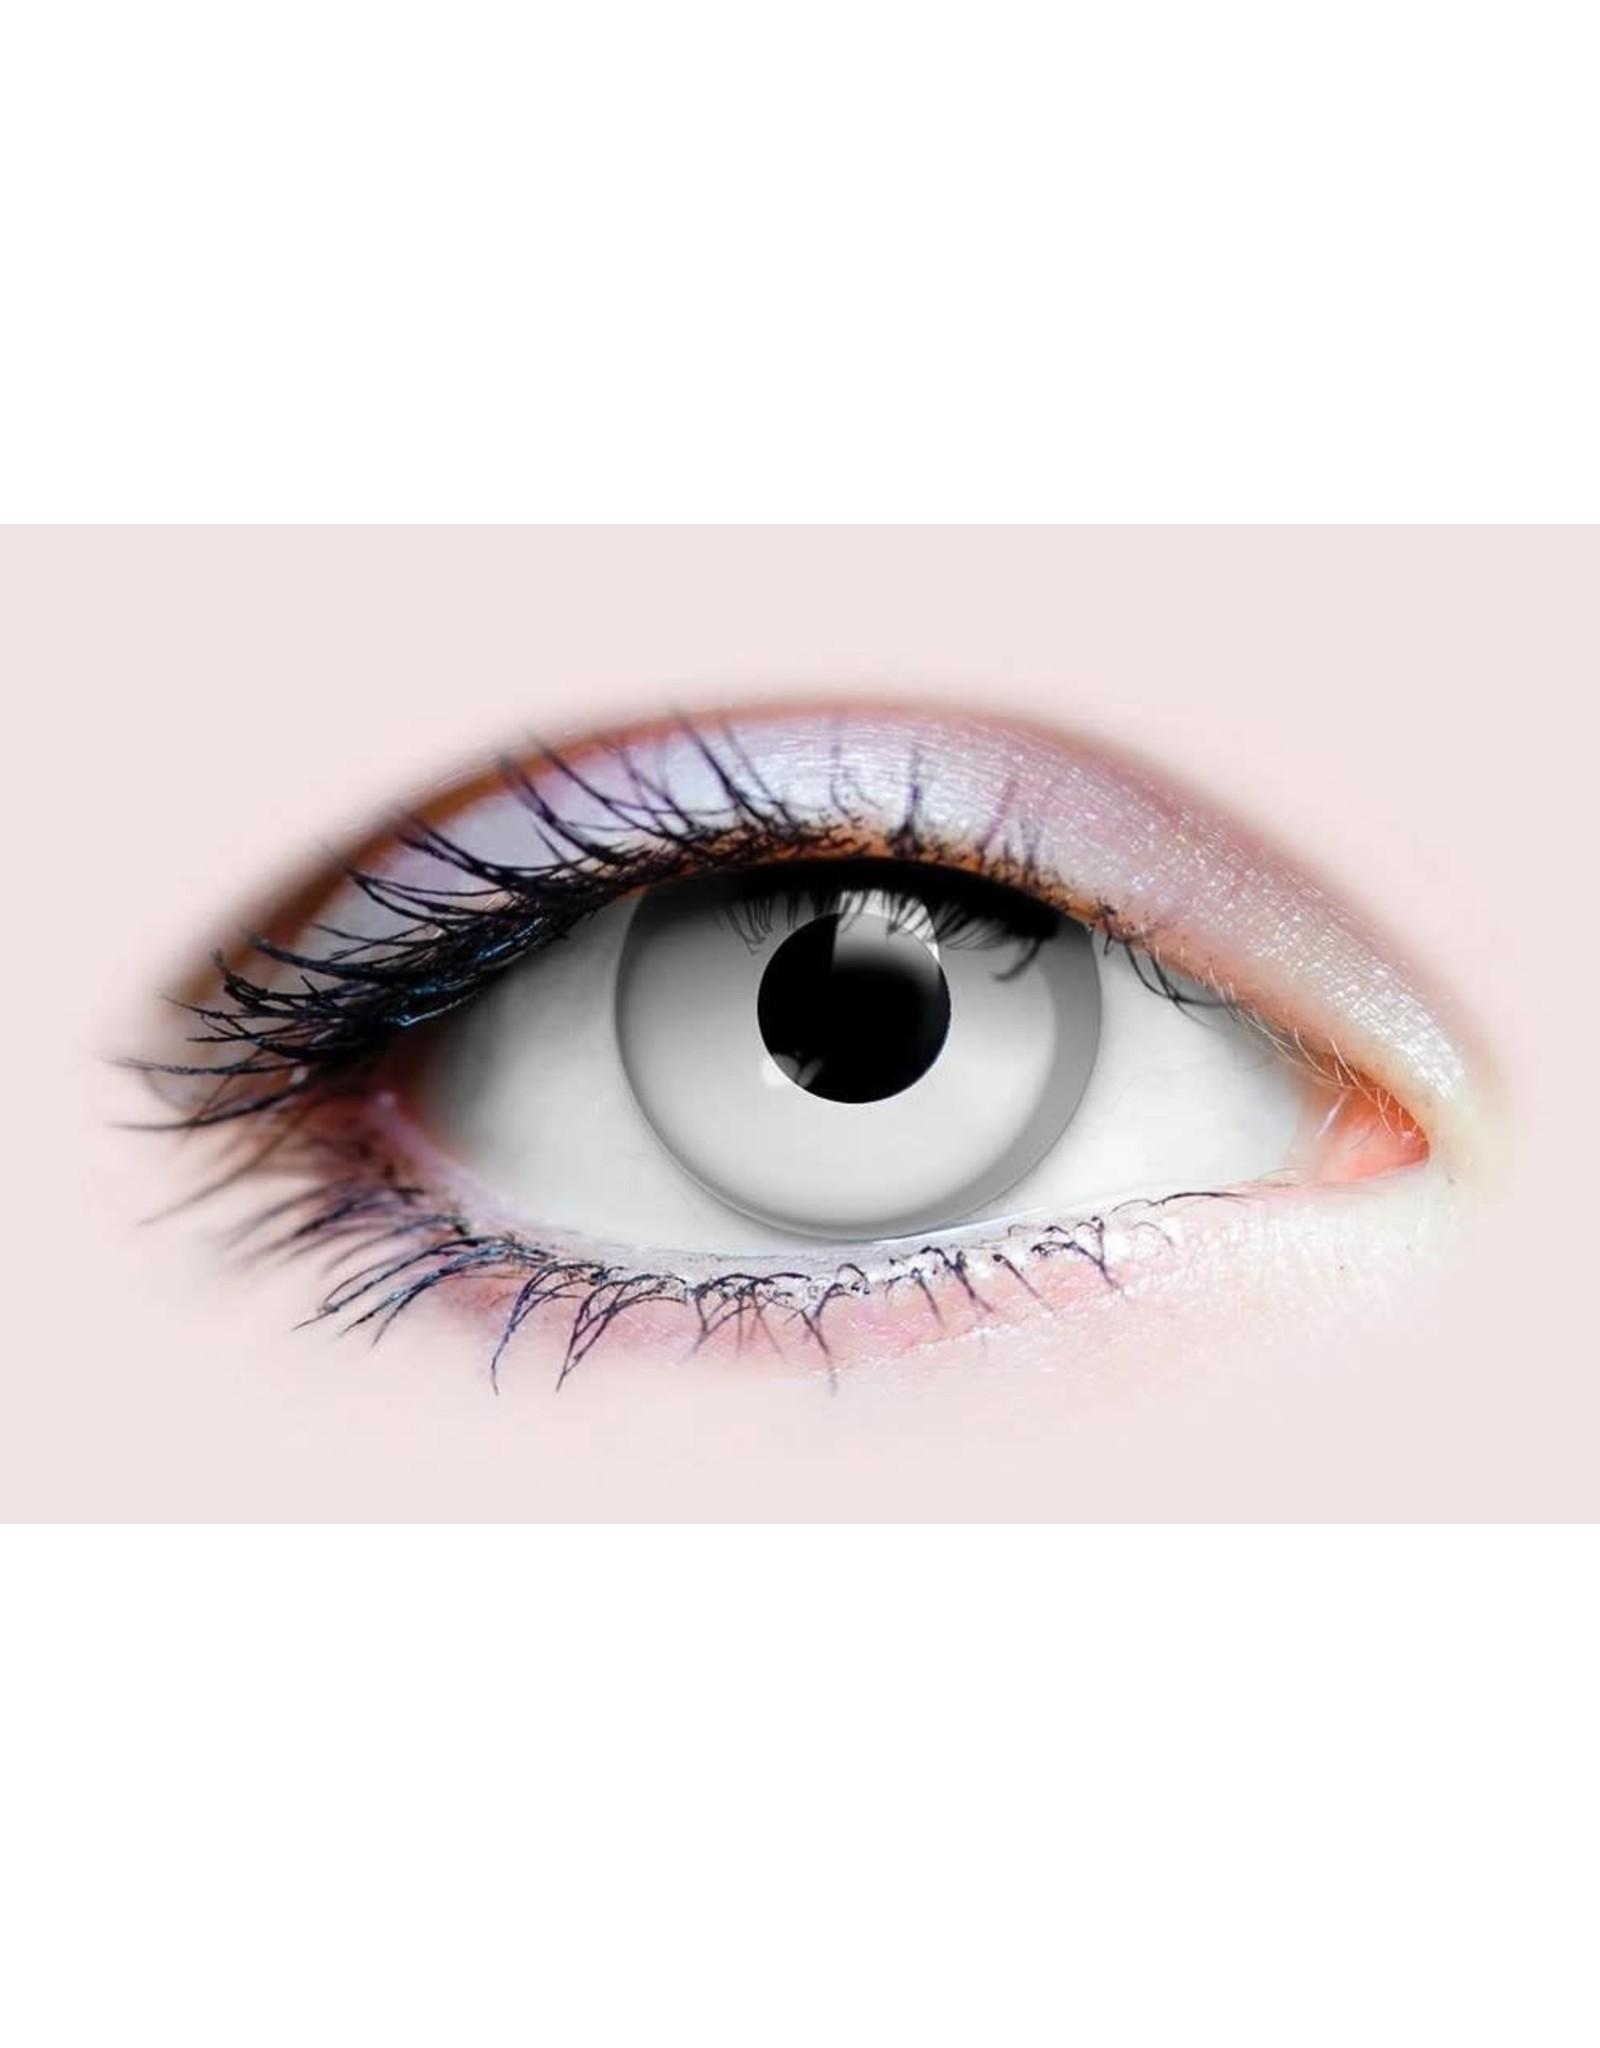 Primal Costume Contact Lenses